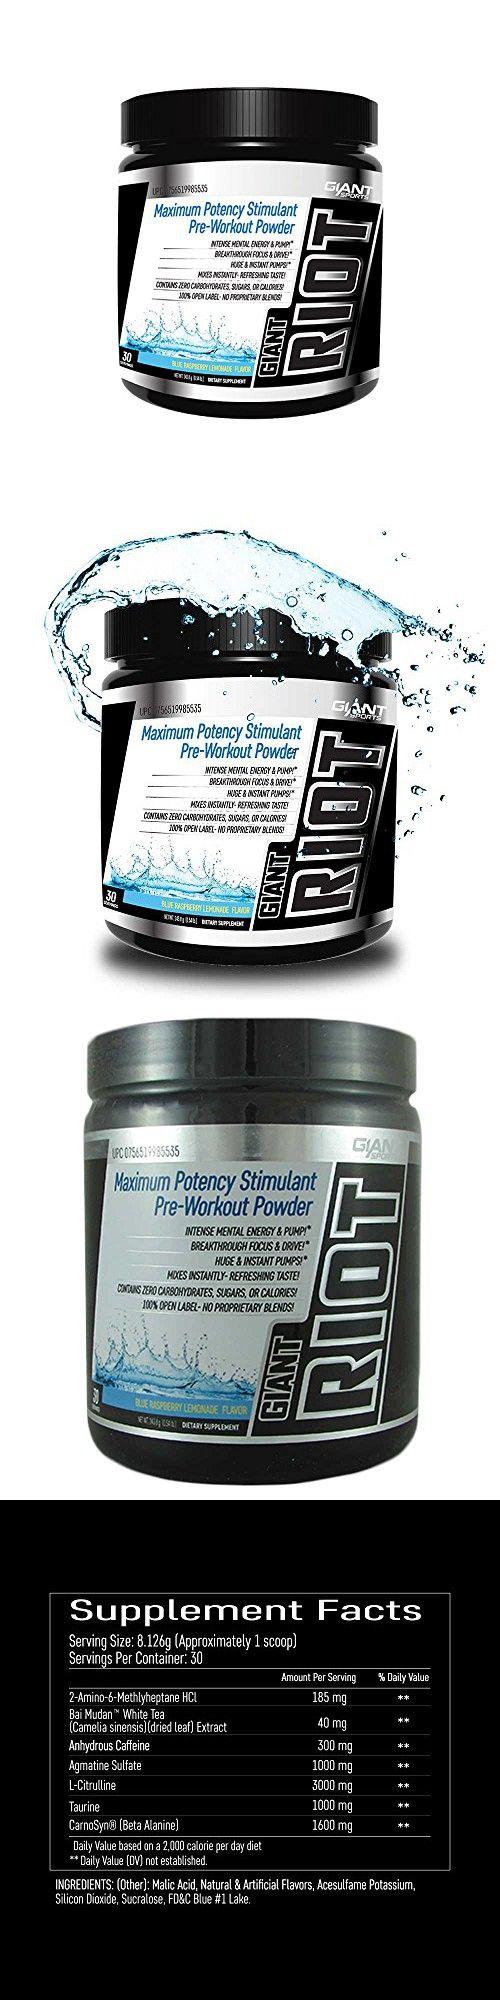 Giant Sports Giant Riot Pre Workout, Supplement Powder,Induces Huge & Instant Pumps, Blue Raspberry Lemonade, 30 Servings